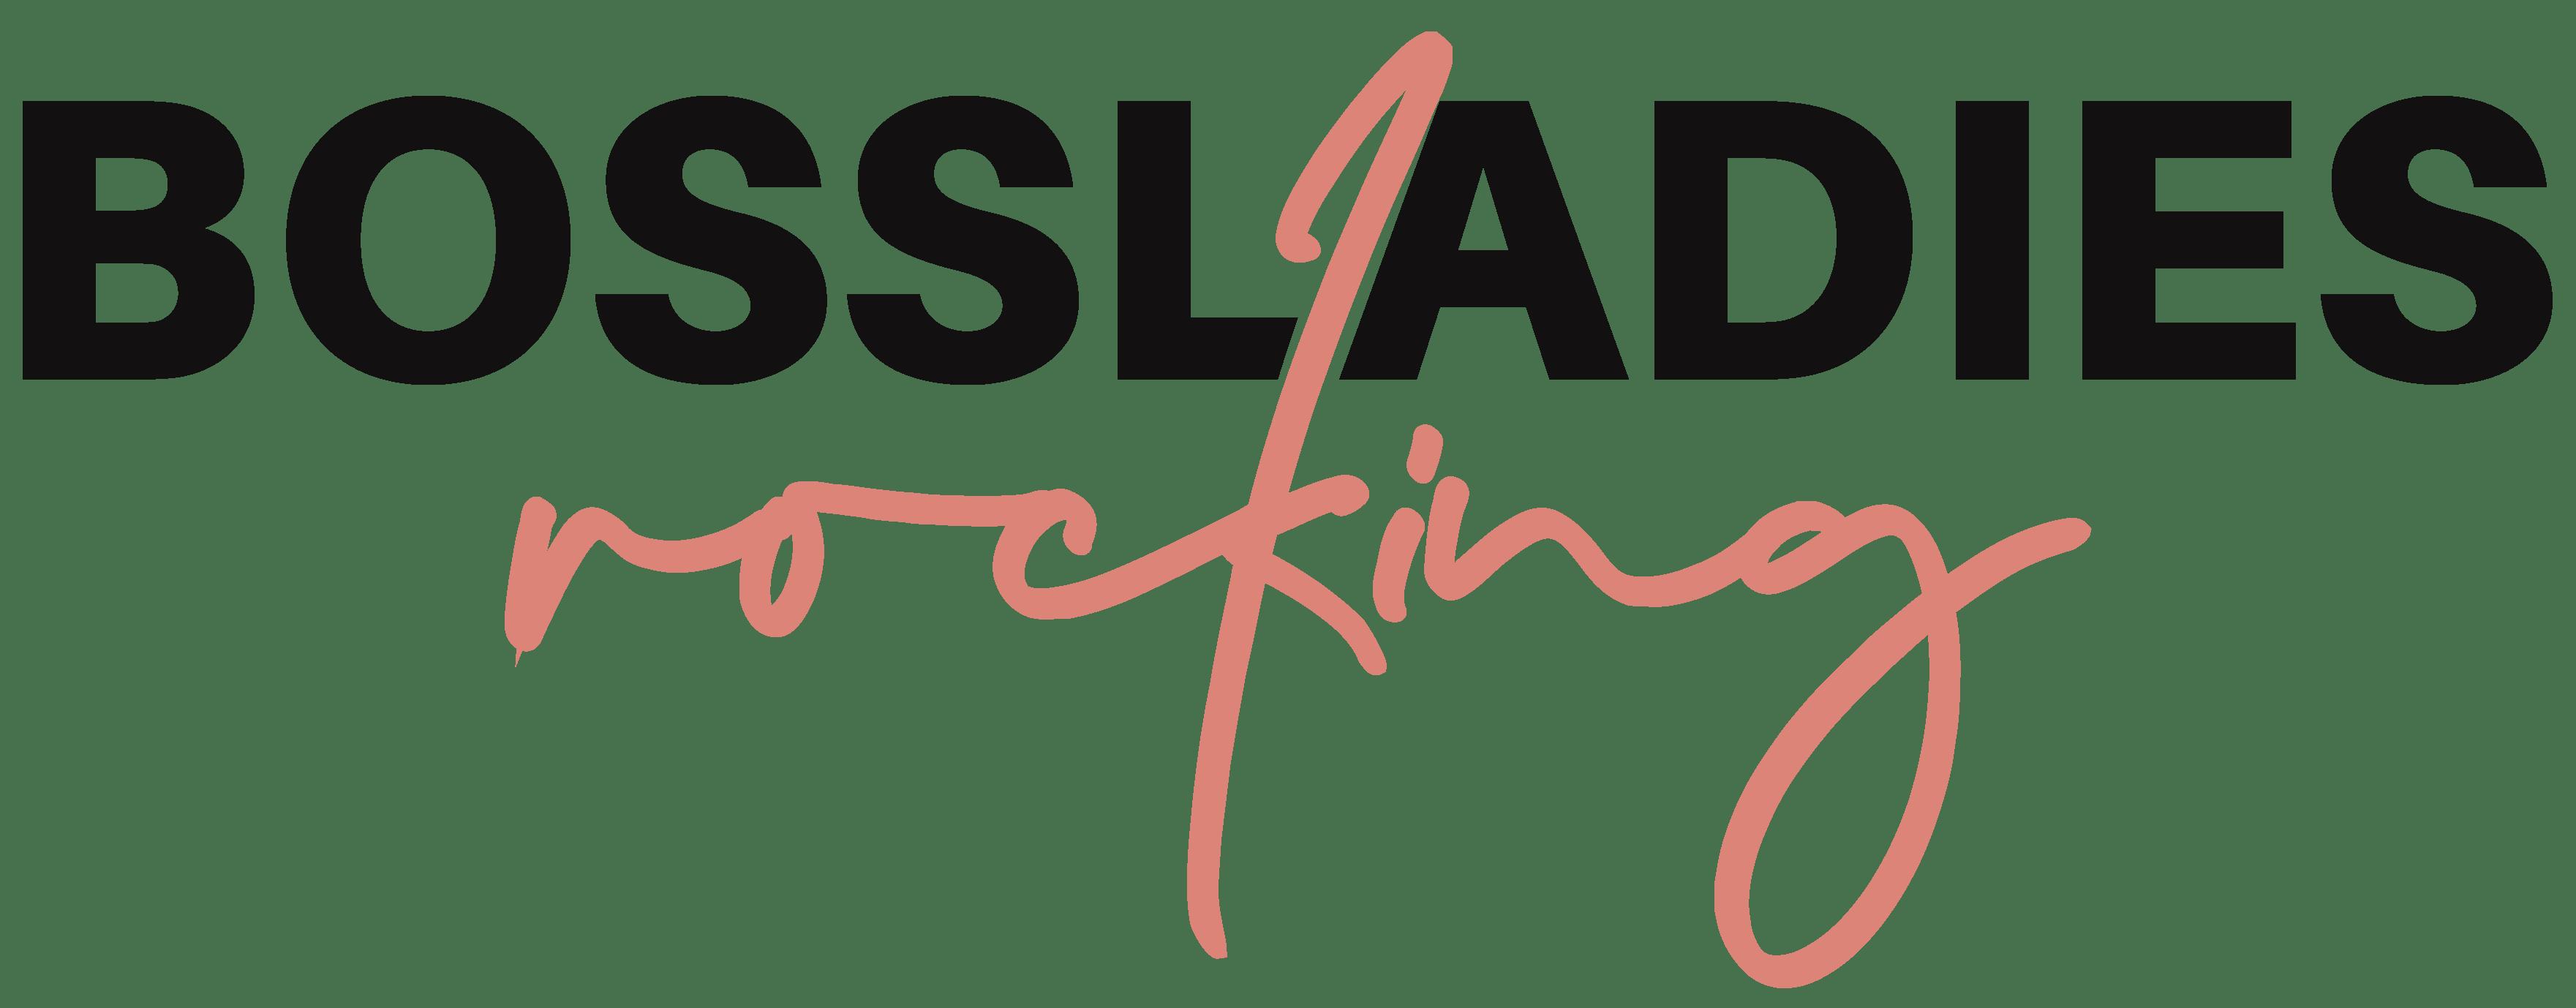 Bossladies Rocking